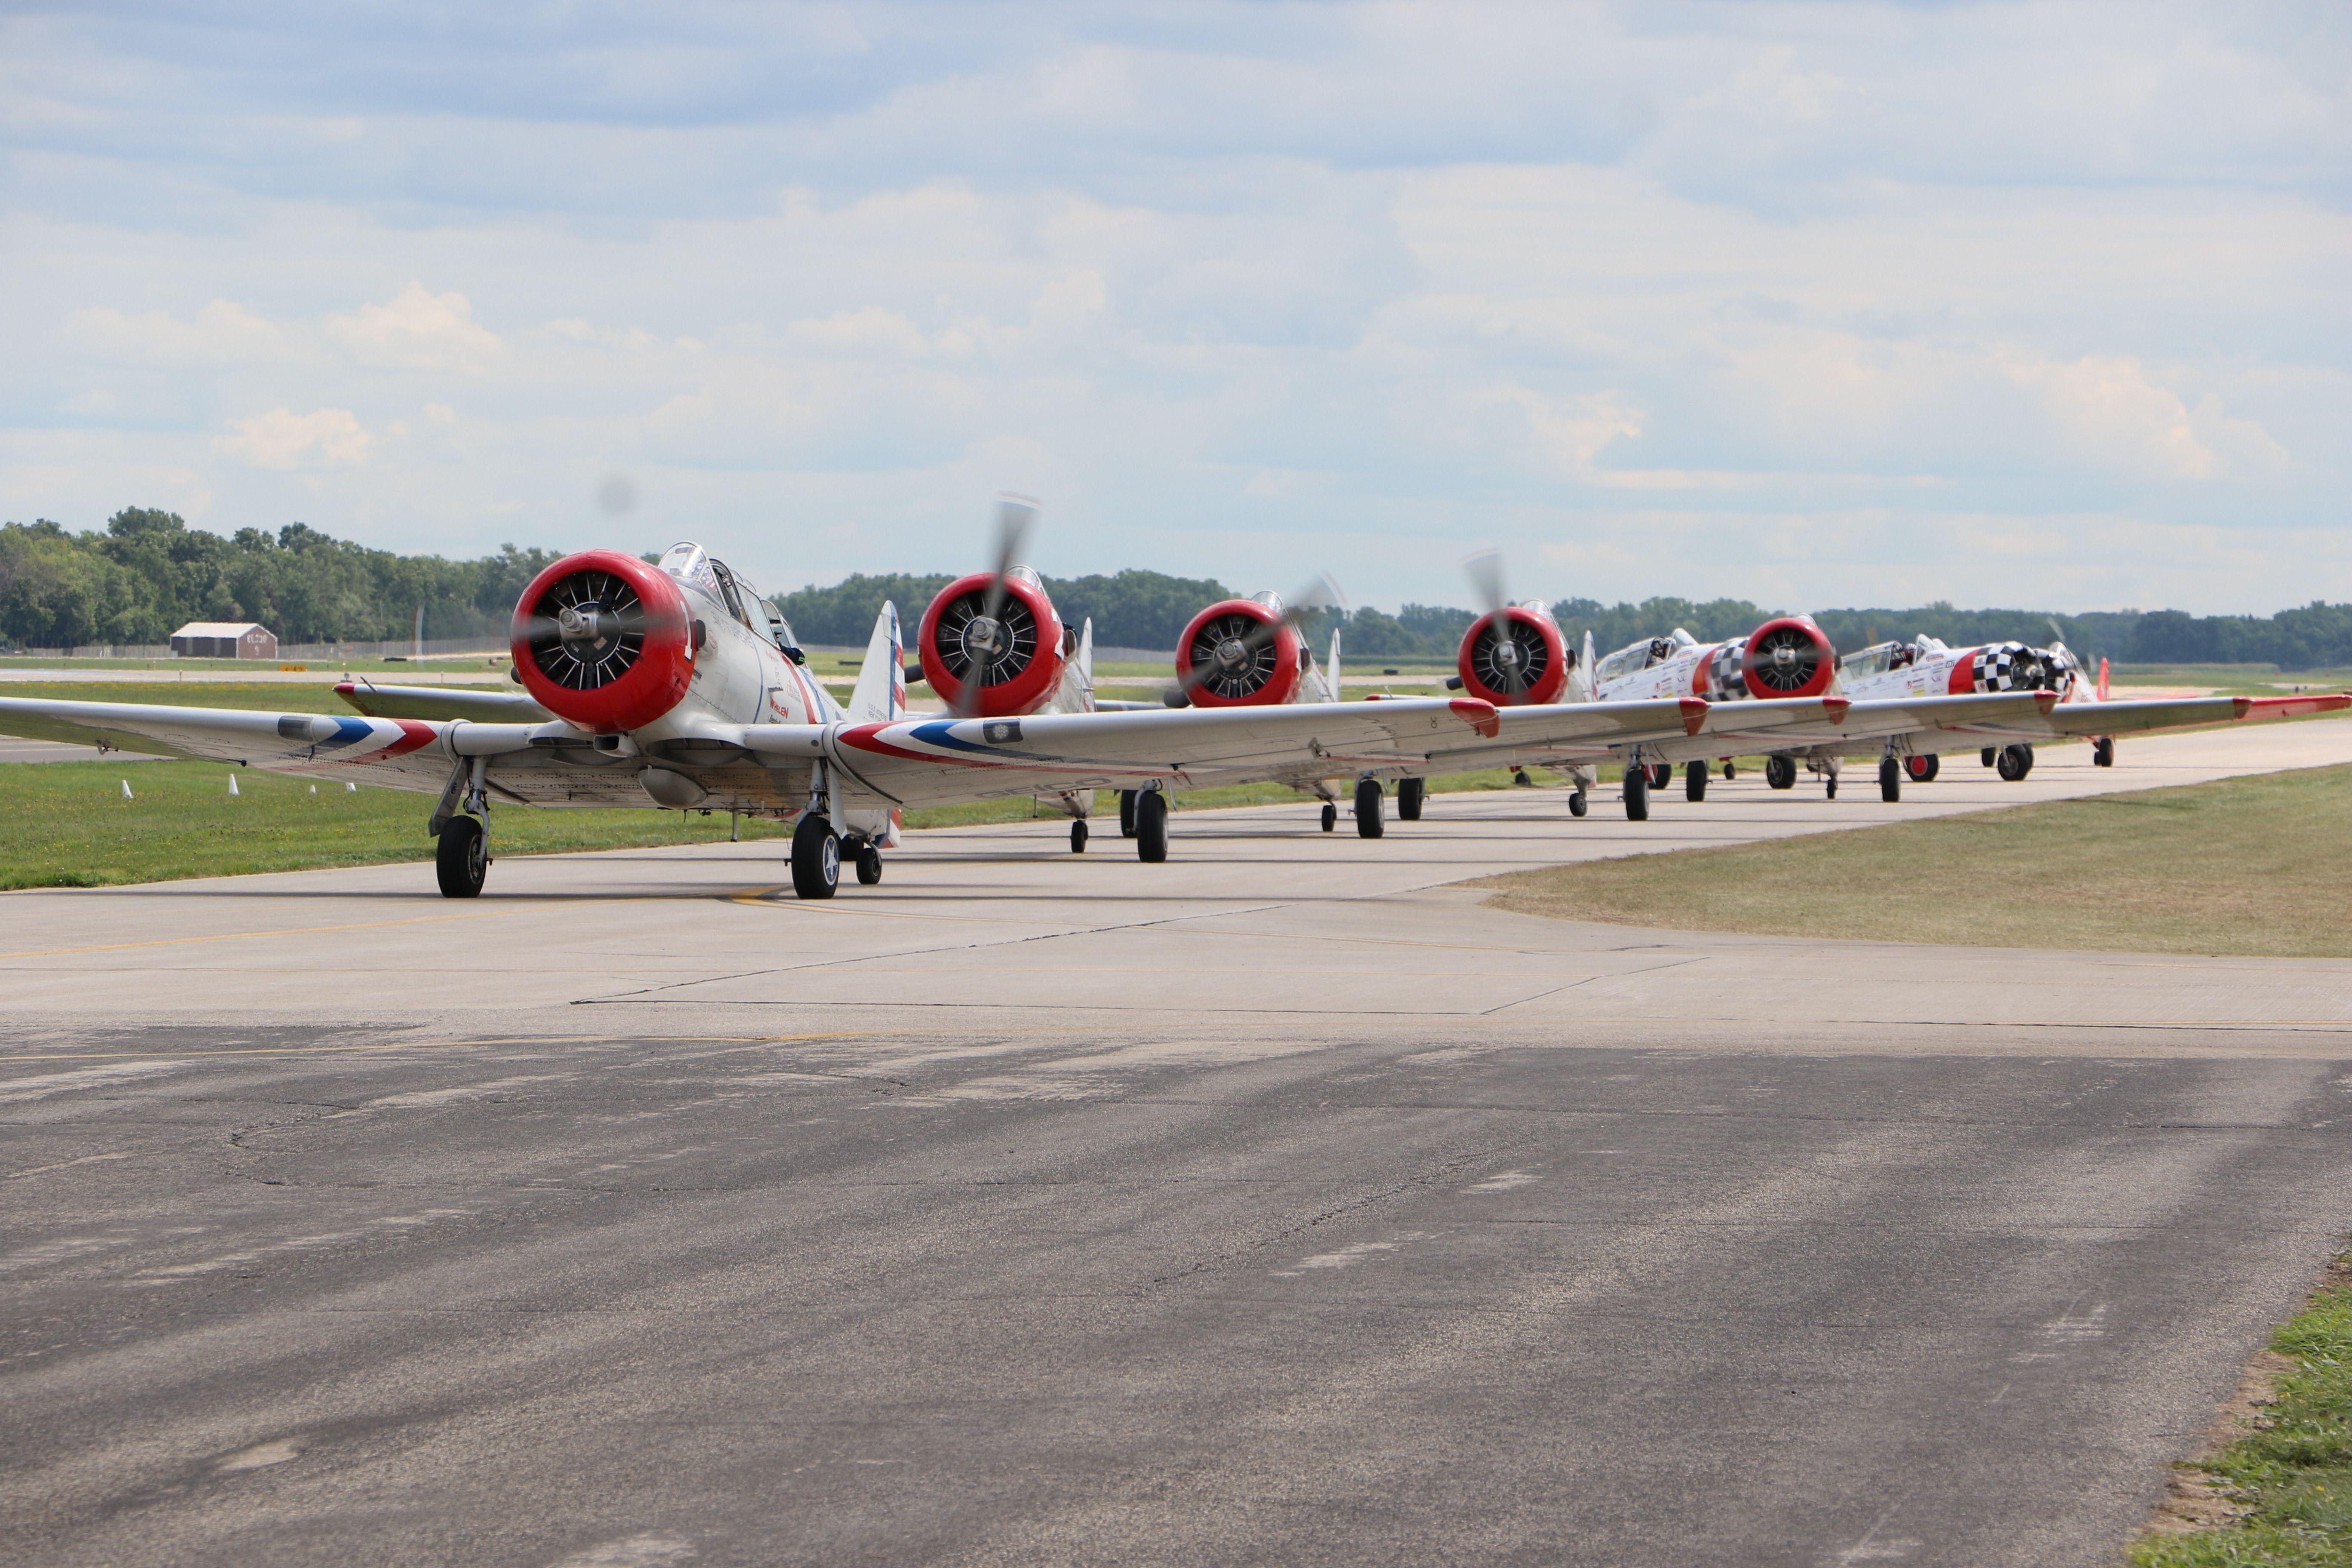 Home Air show, Air race, Warbirds